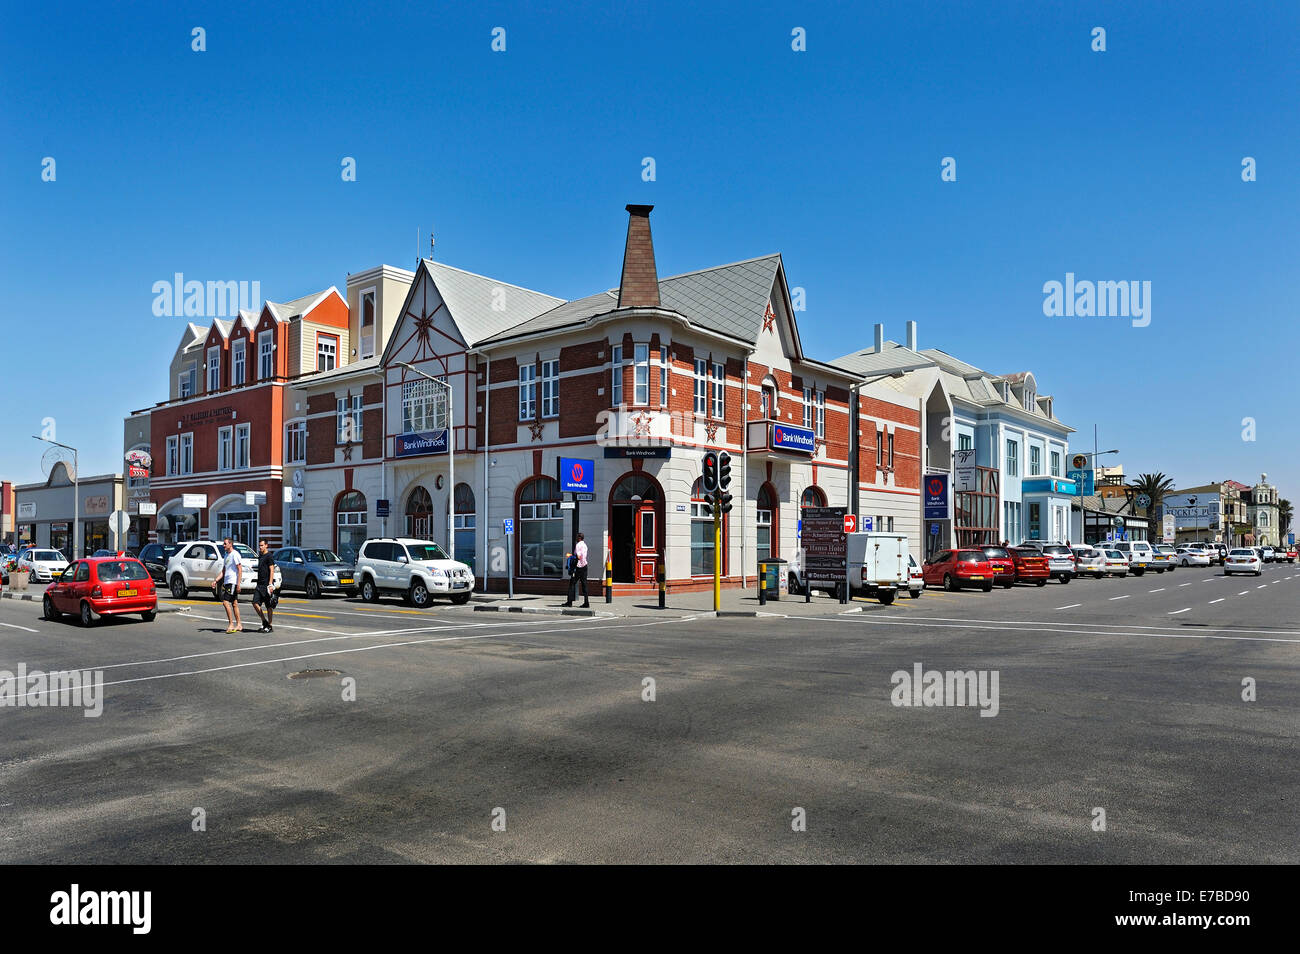 Rows of houses, Bank Windhoek, Swakopmund, Erongo Region, Namibia - Stock Image